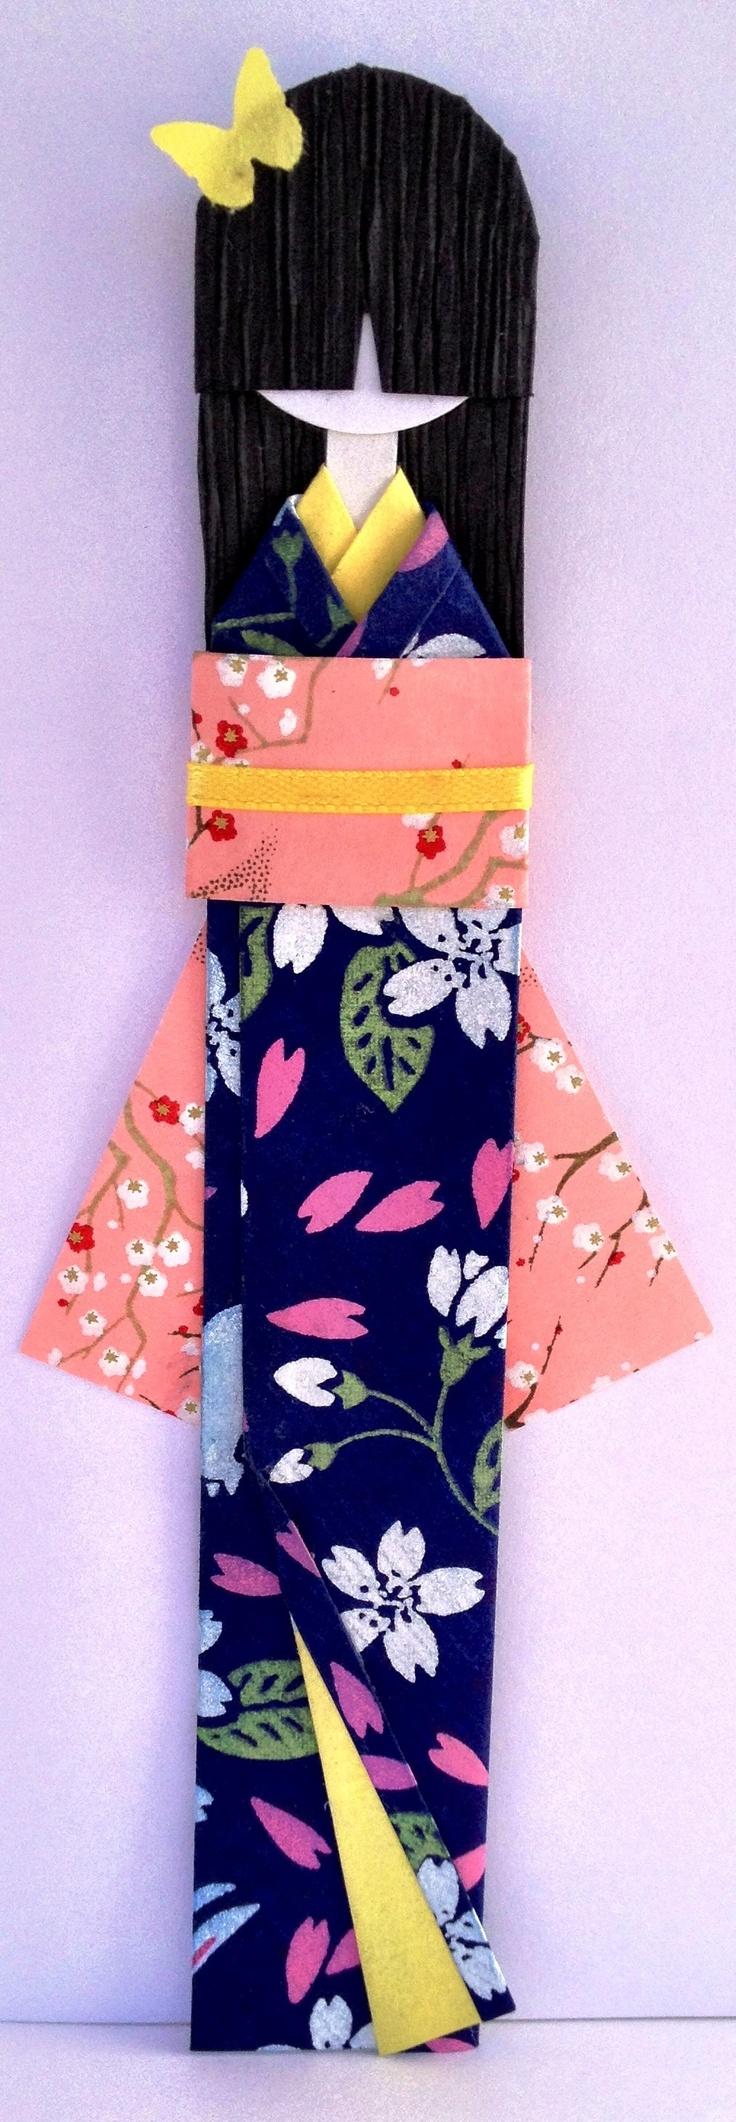 Tsukiko (Moon Child) Japanese Washi Paper Bookmark Doll.